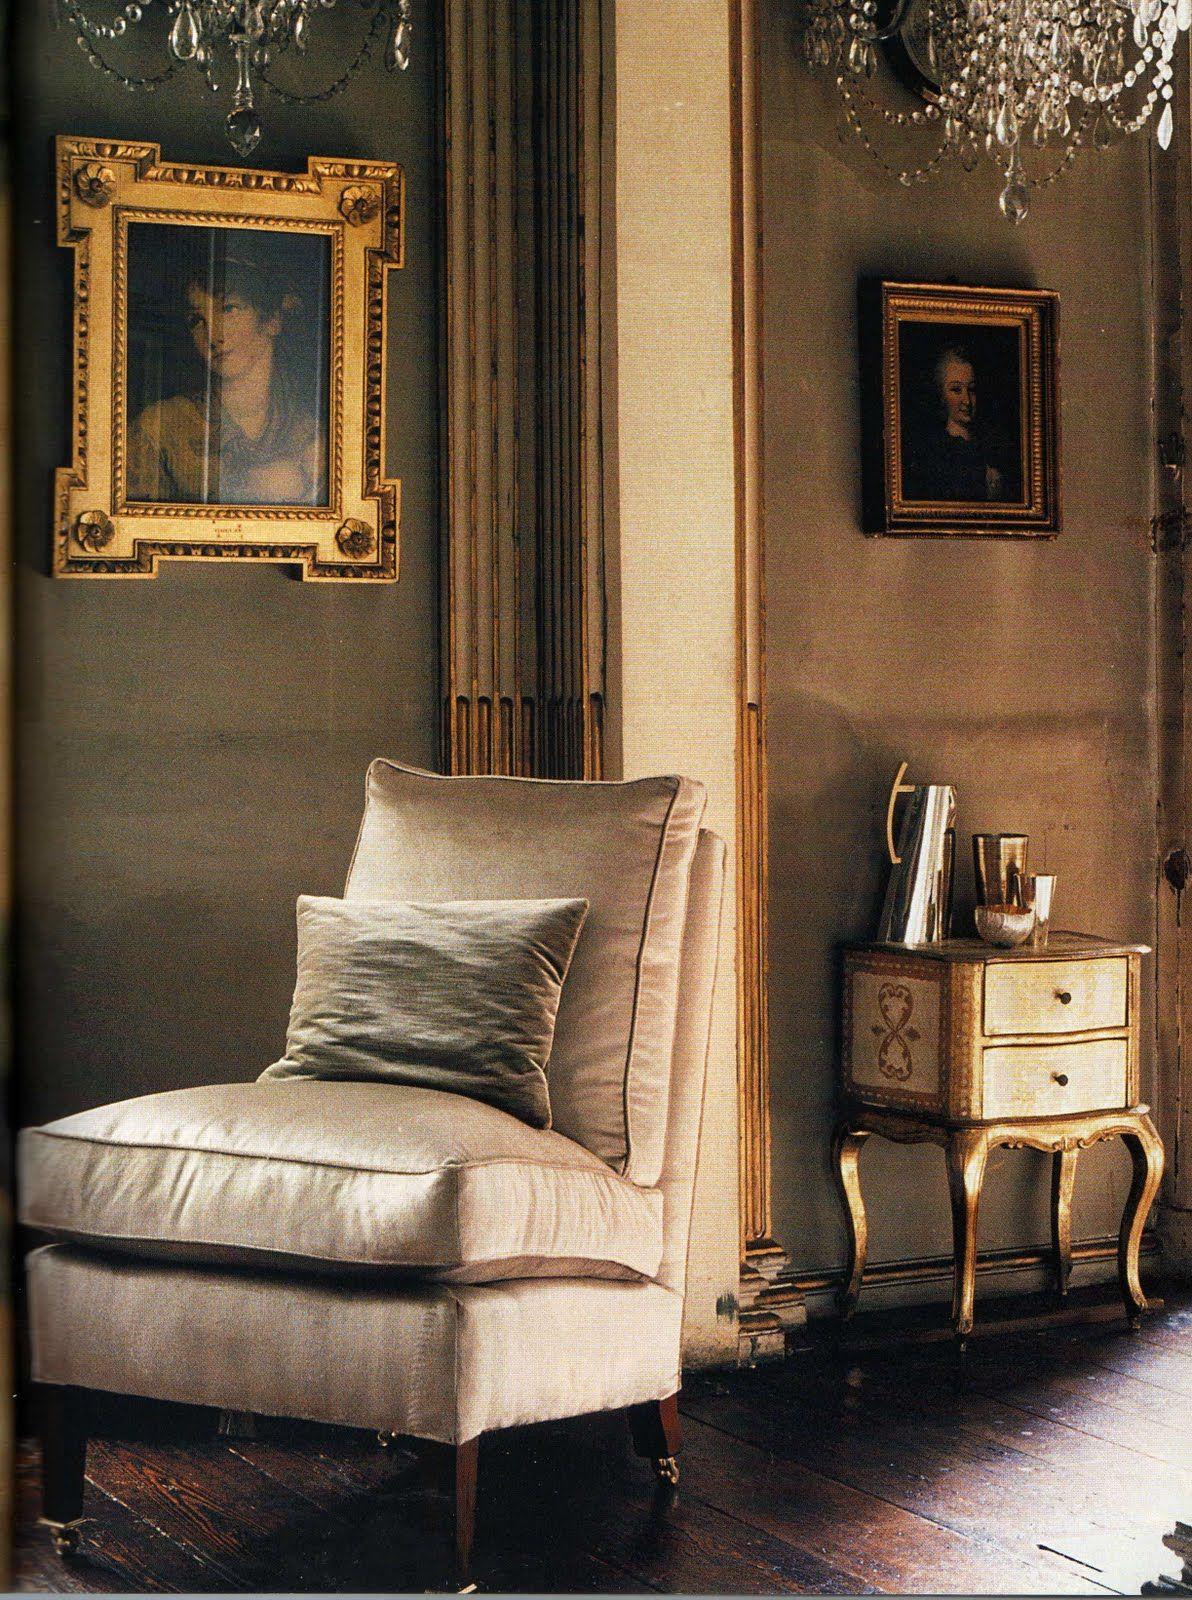 Interior home decorating ideas living room home decorating ideas  gray decorating gilded frame french